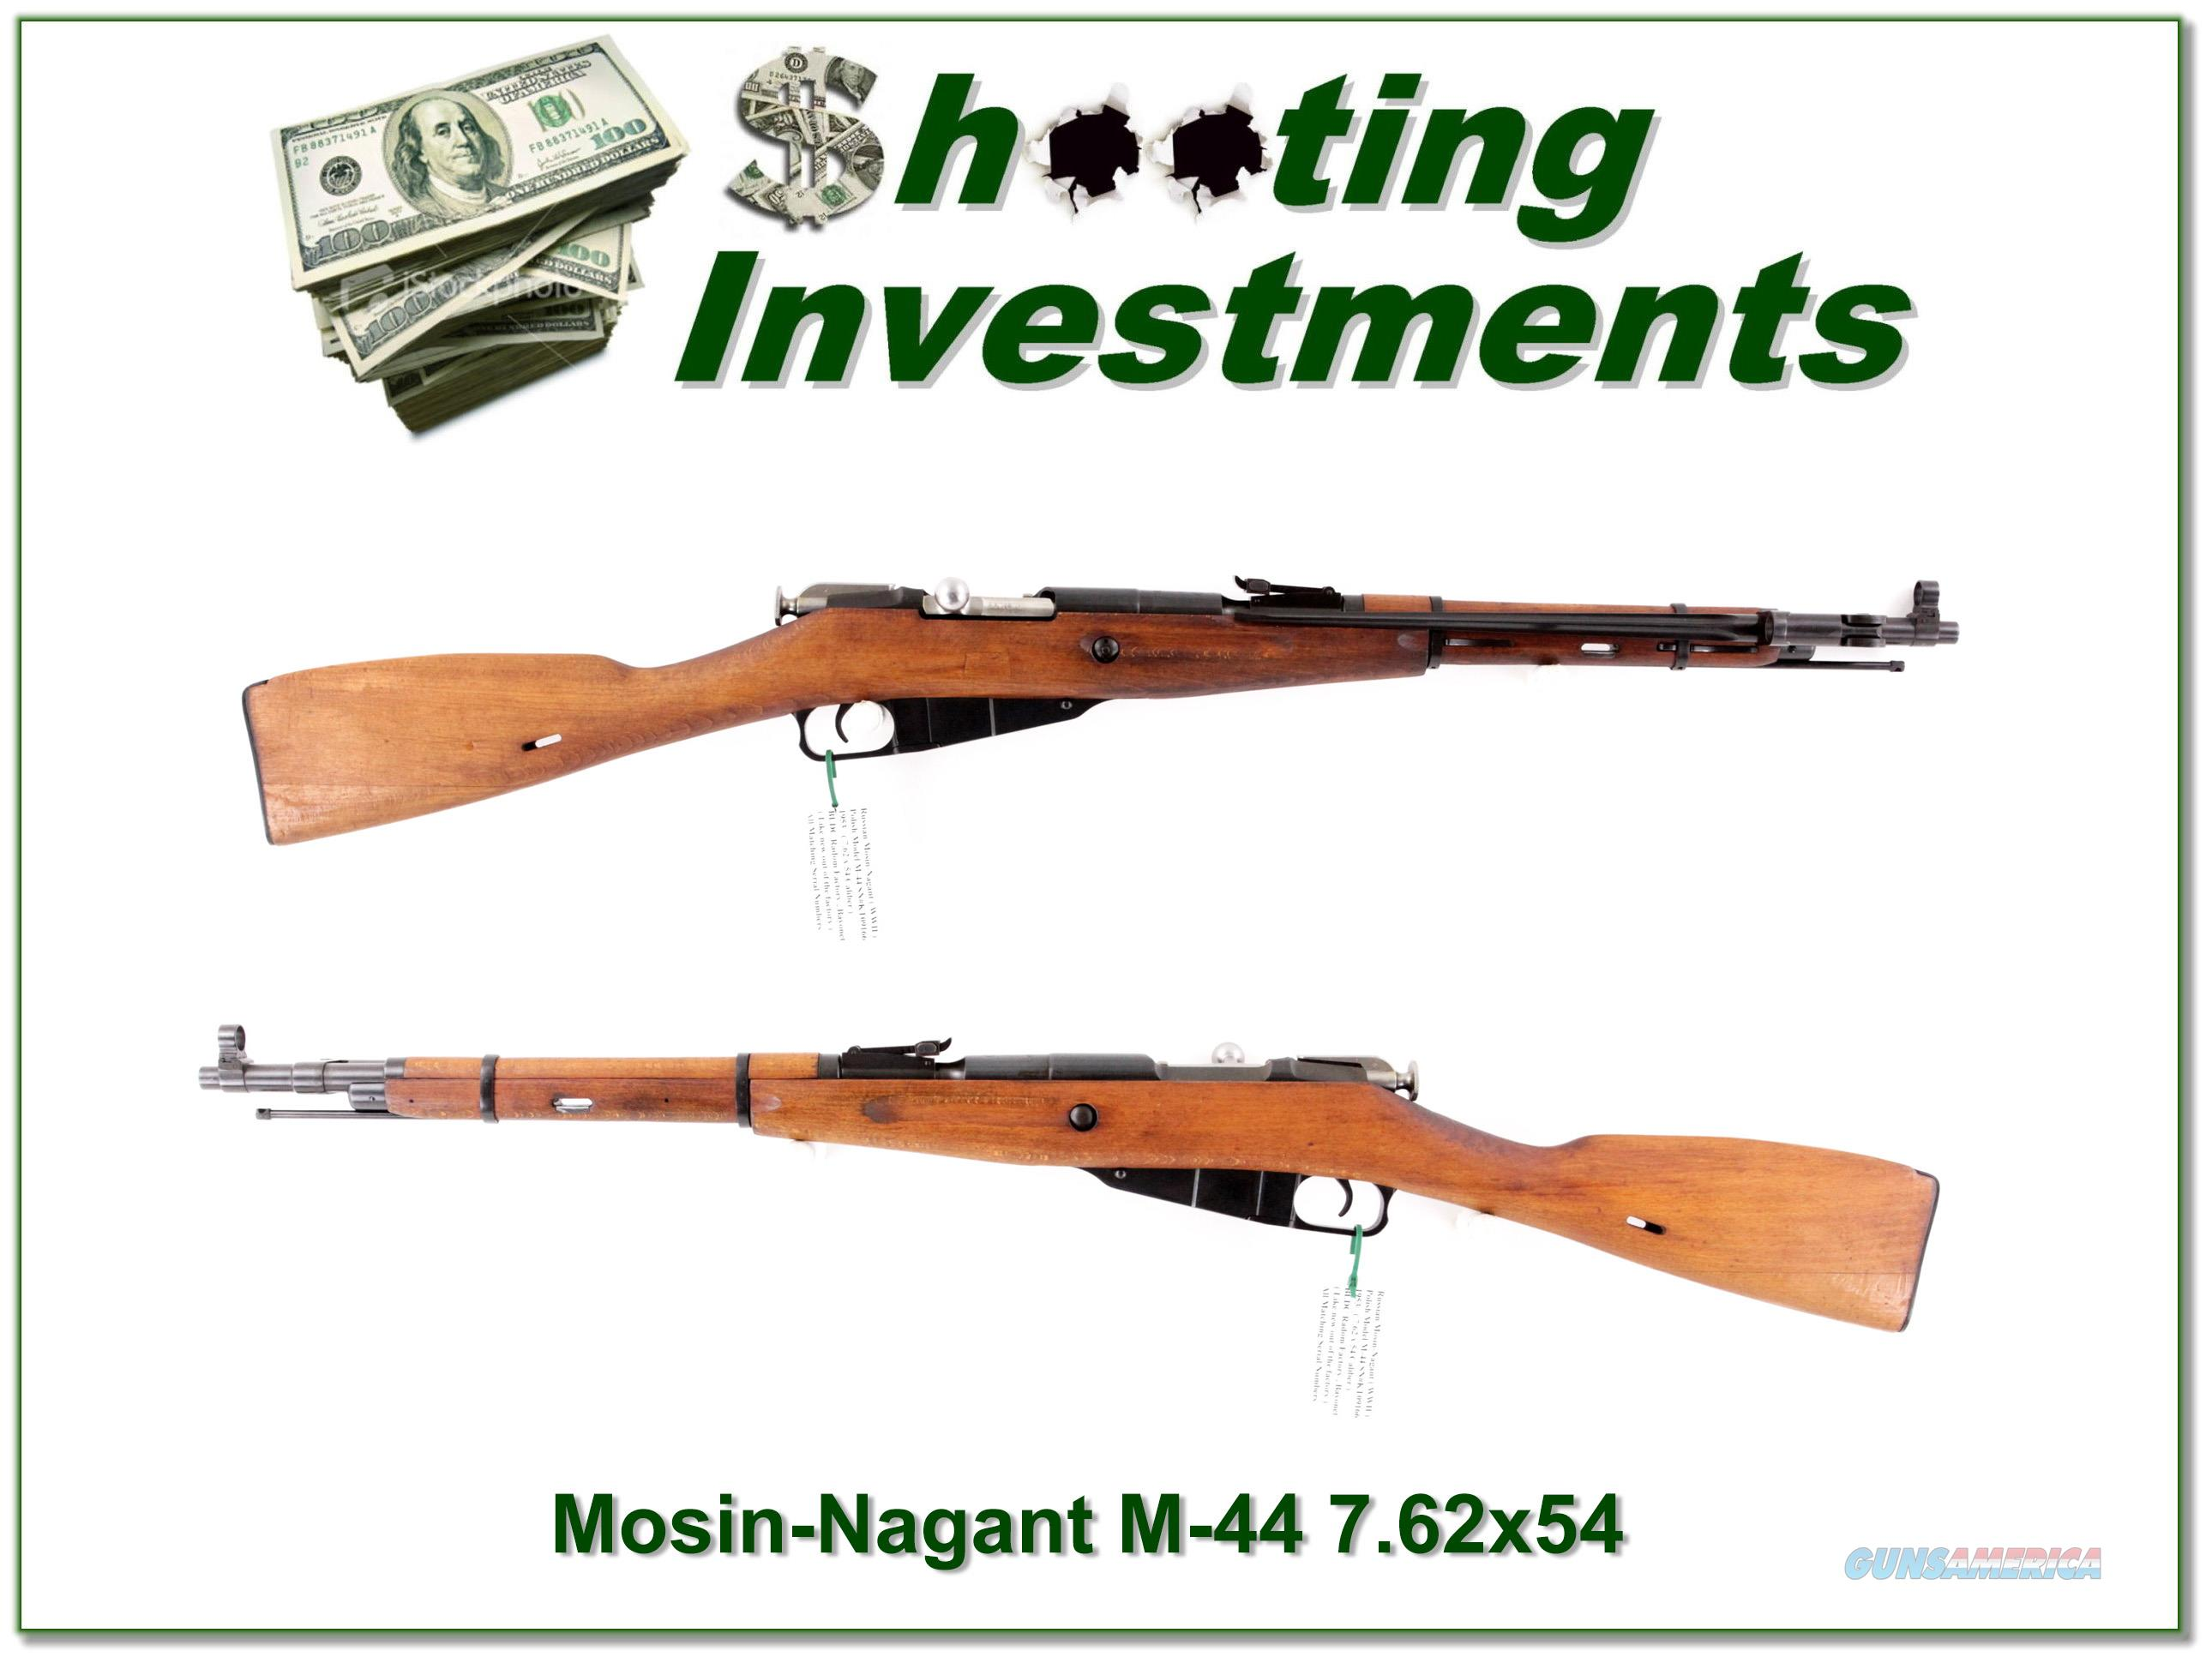 Russian Mosin-Nagant M-44 in 7.62x54 as new all matching  Guns > Rifles > Mosin-Nagant Rifles/Carbines